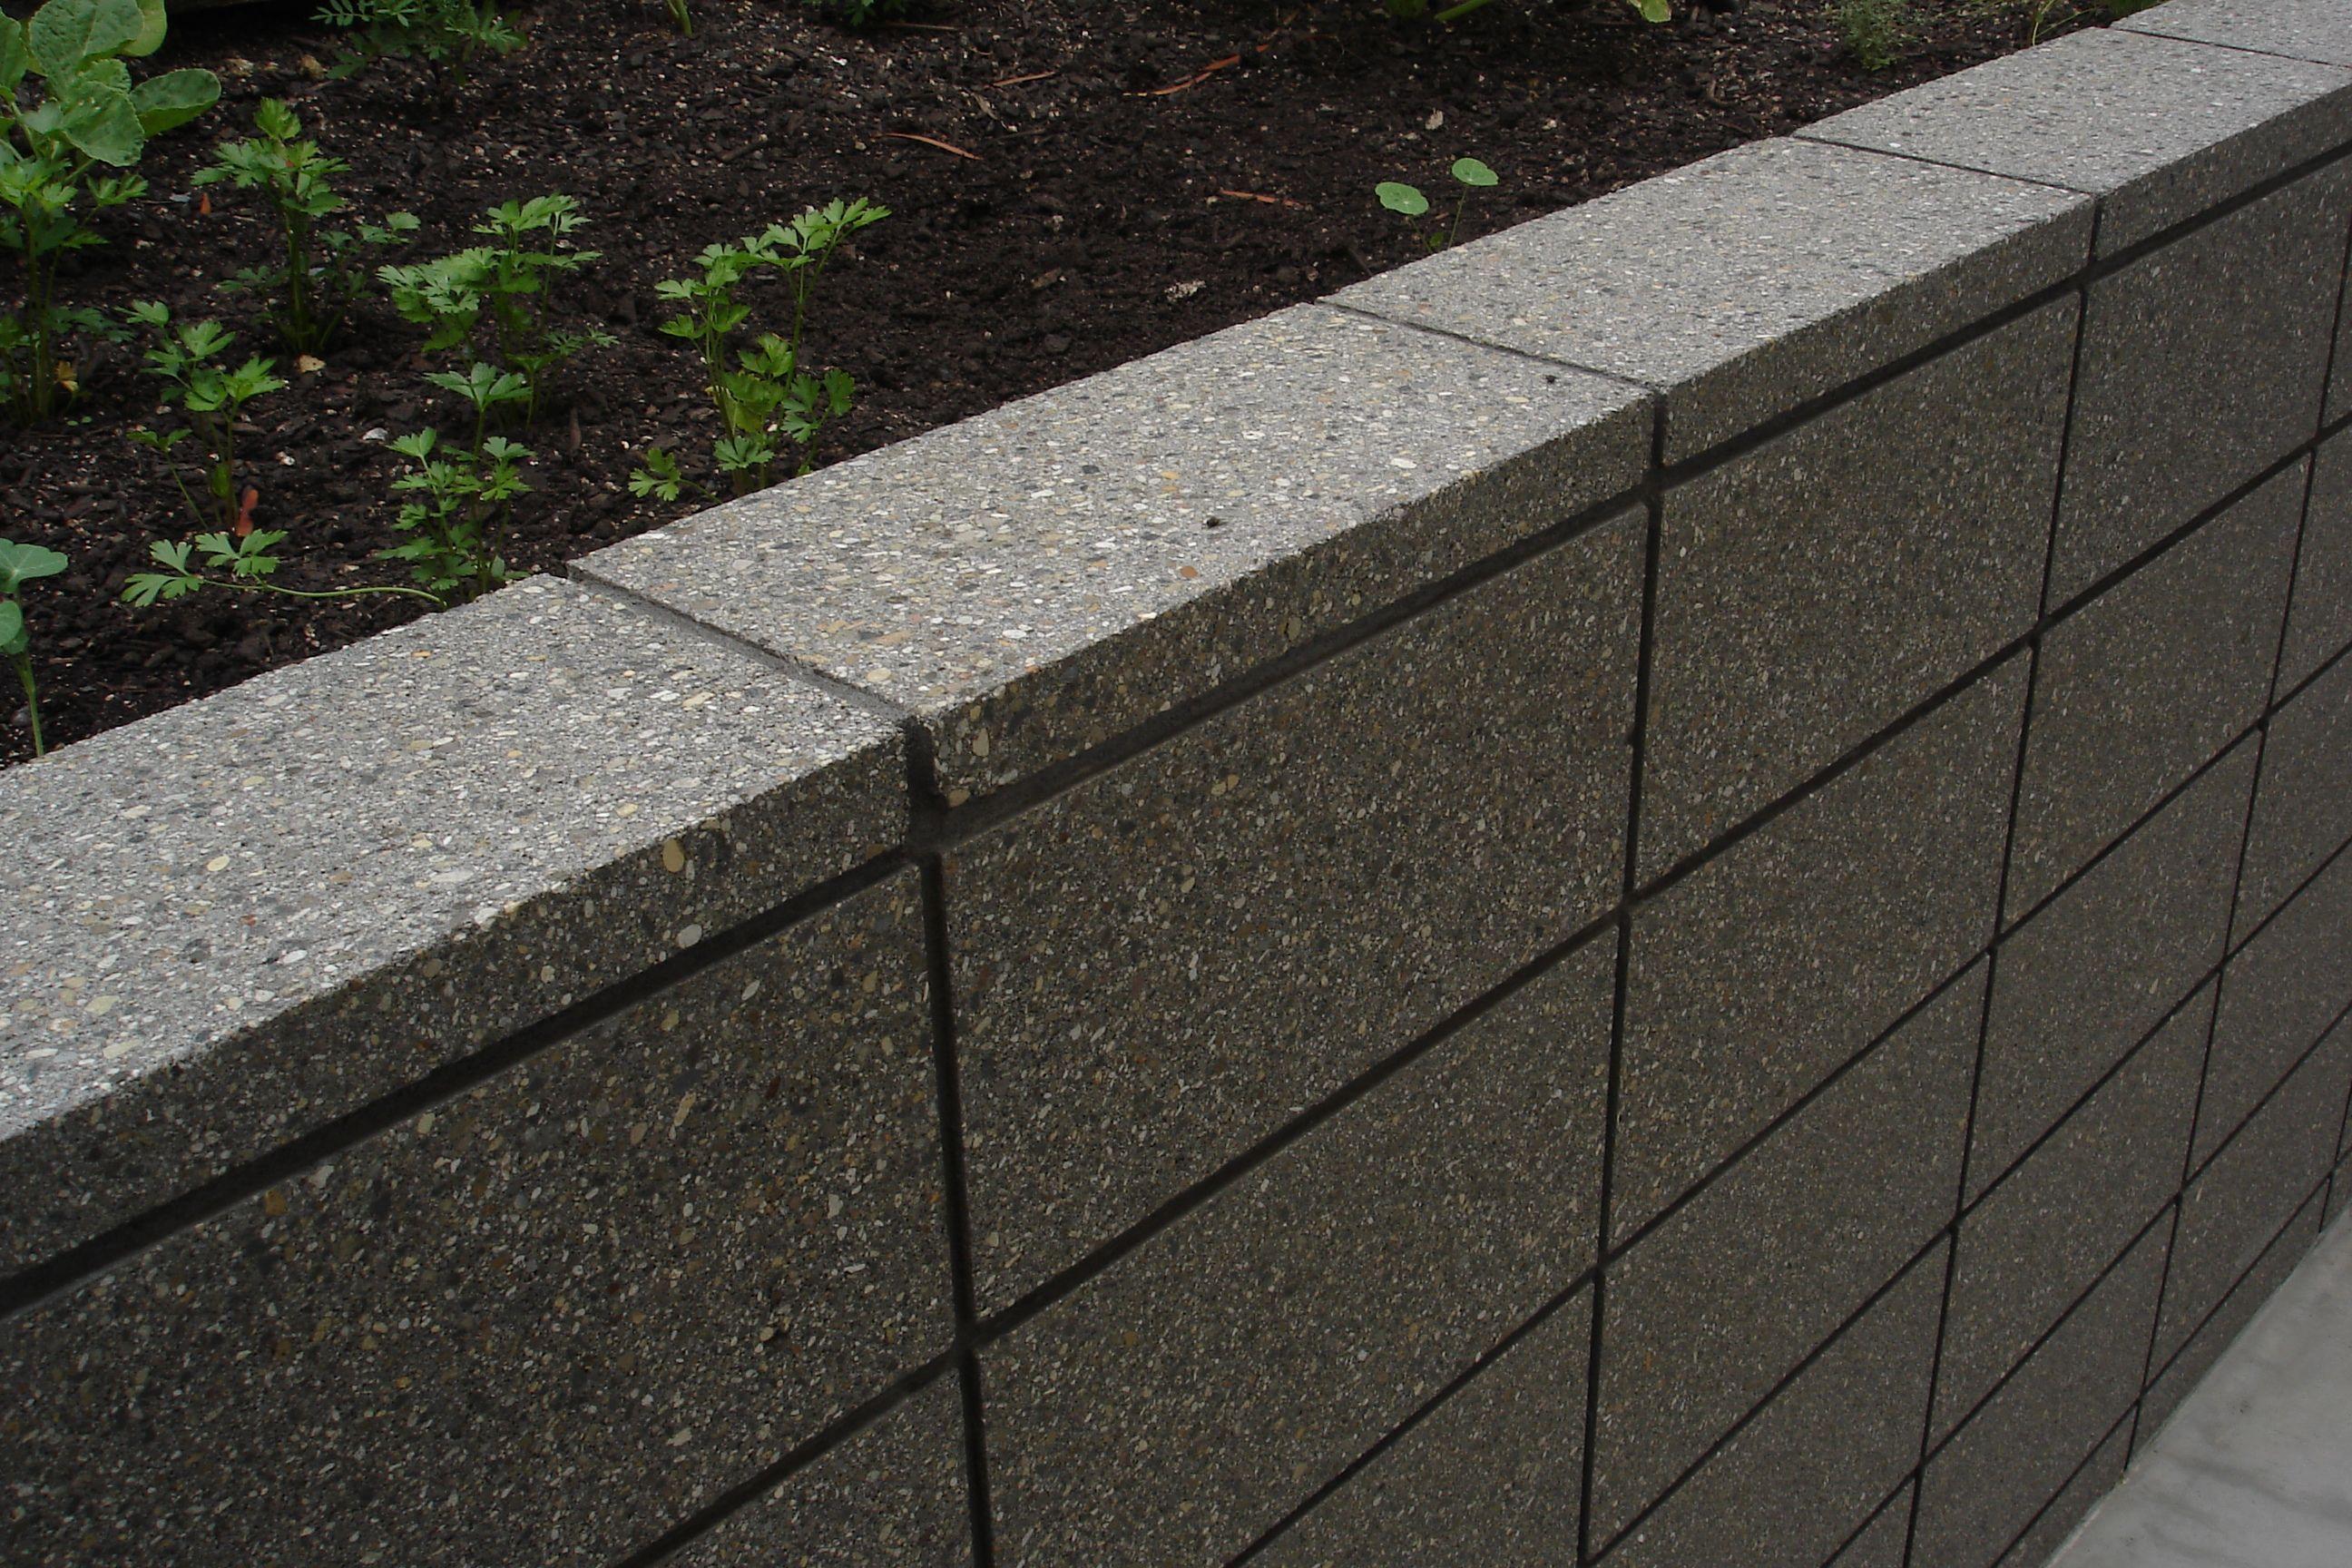 Image Result For Inline Cinderblock Retaining Walls Vancouver Concrete Retaining Walls Concrete Block Retaining Wall Landscaping Retaining Walls